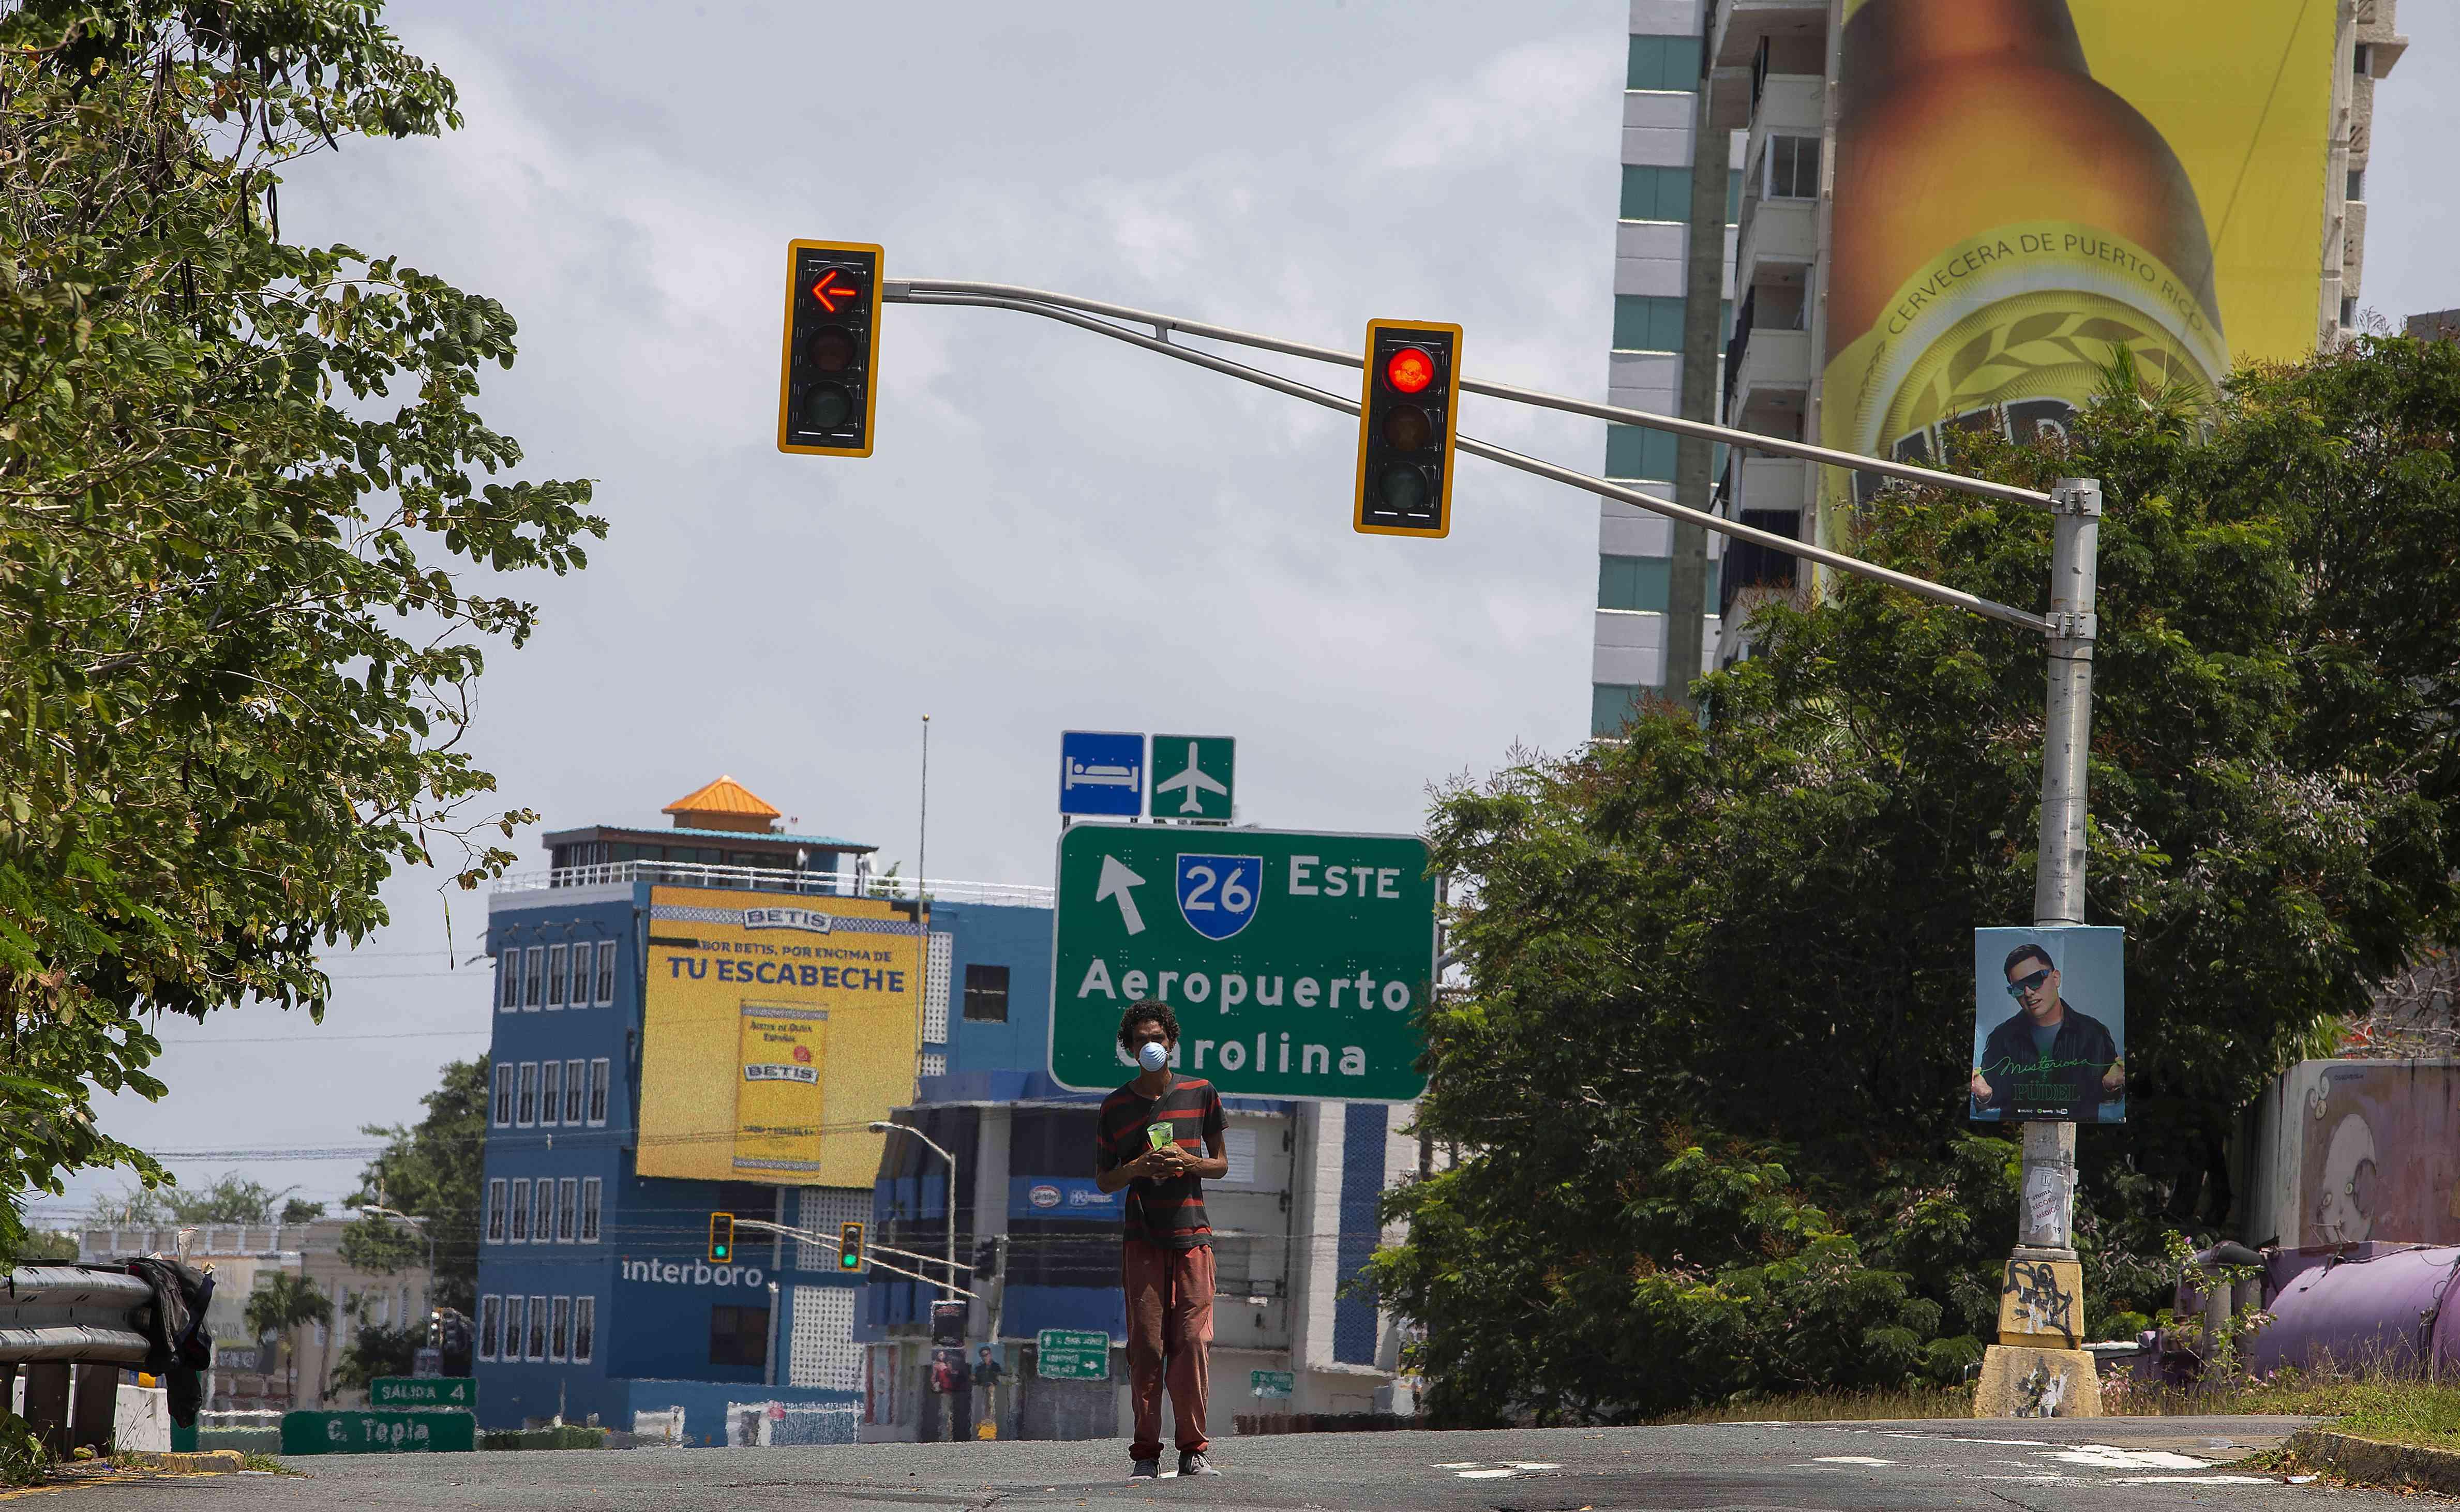 Puerto Rico Governor Wanda Vázquez imposed curfew to contain the coronavirus spread